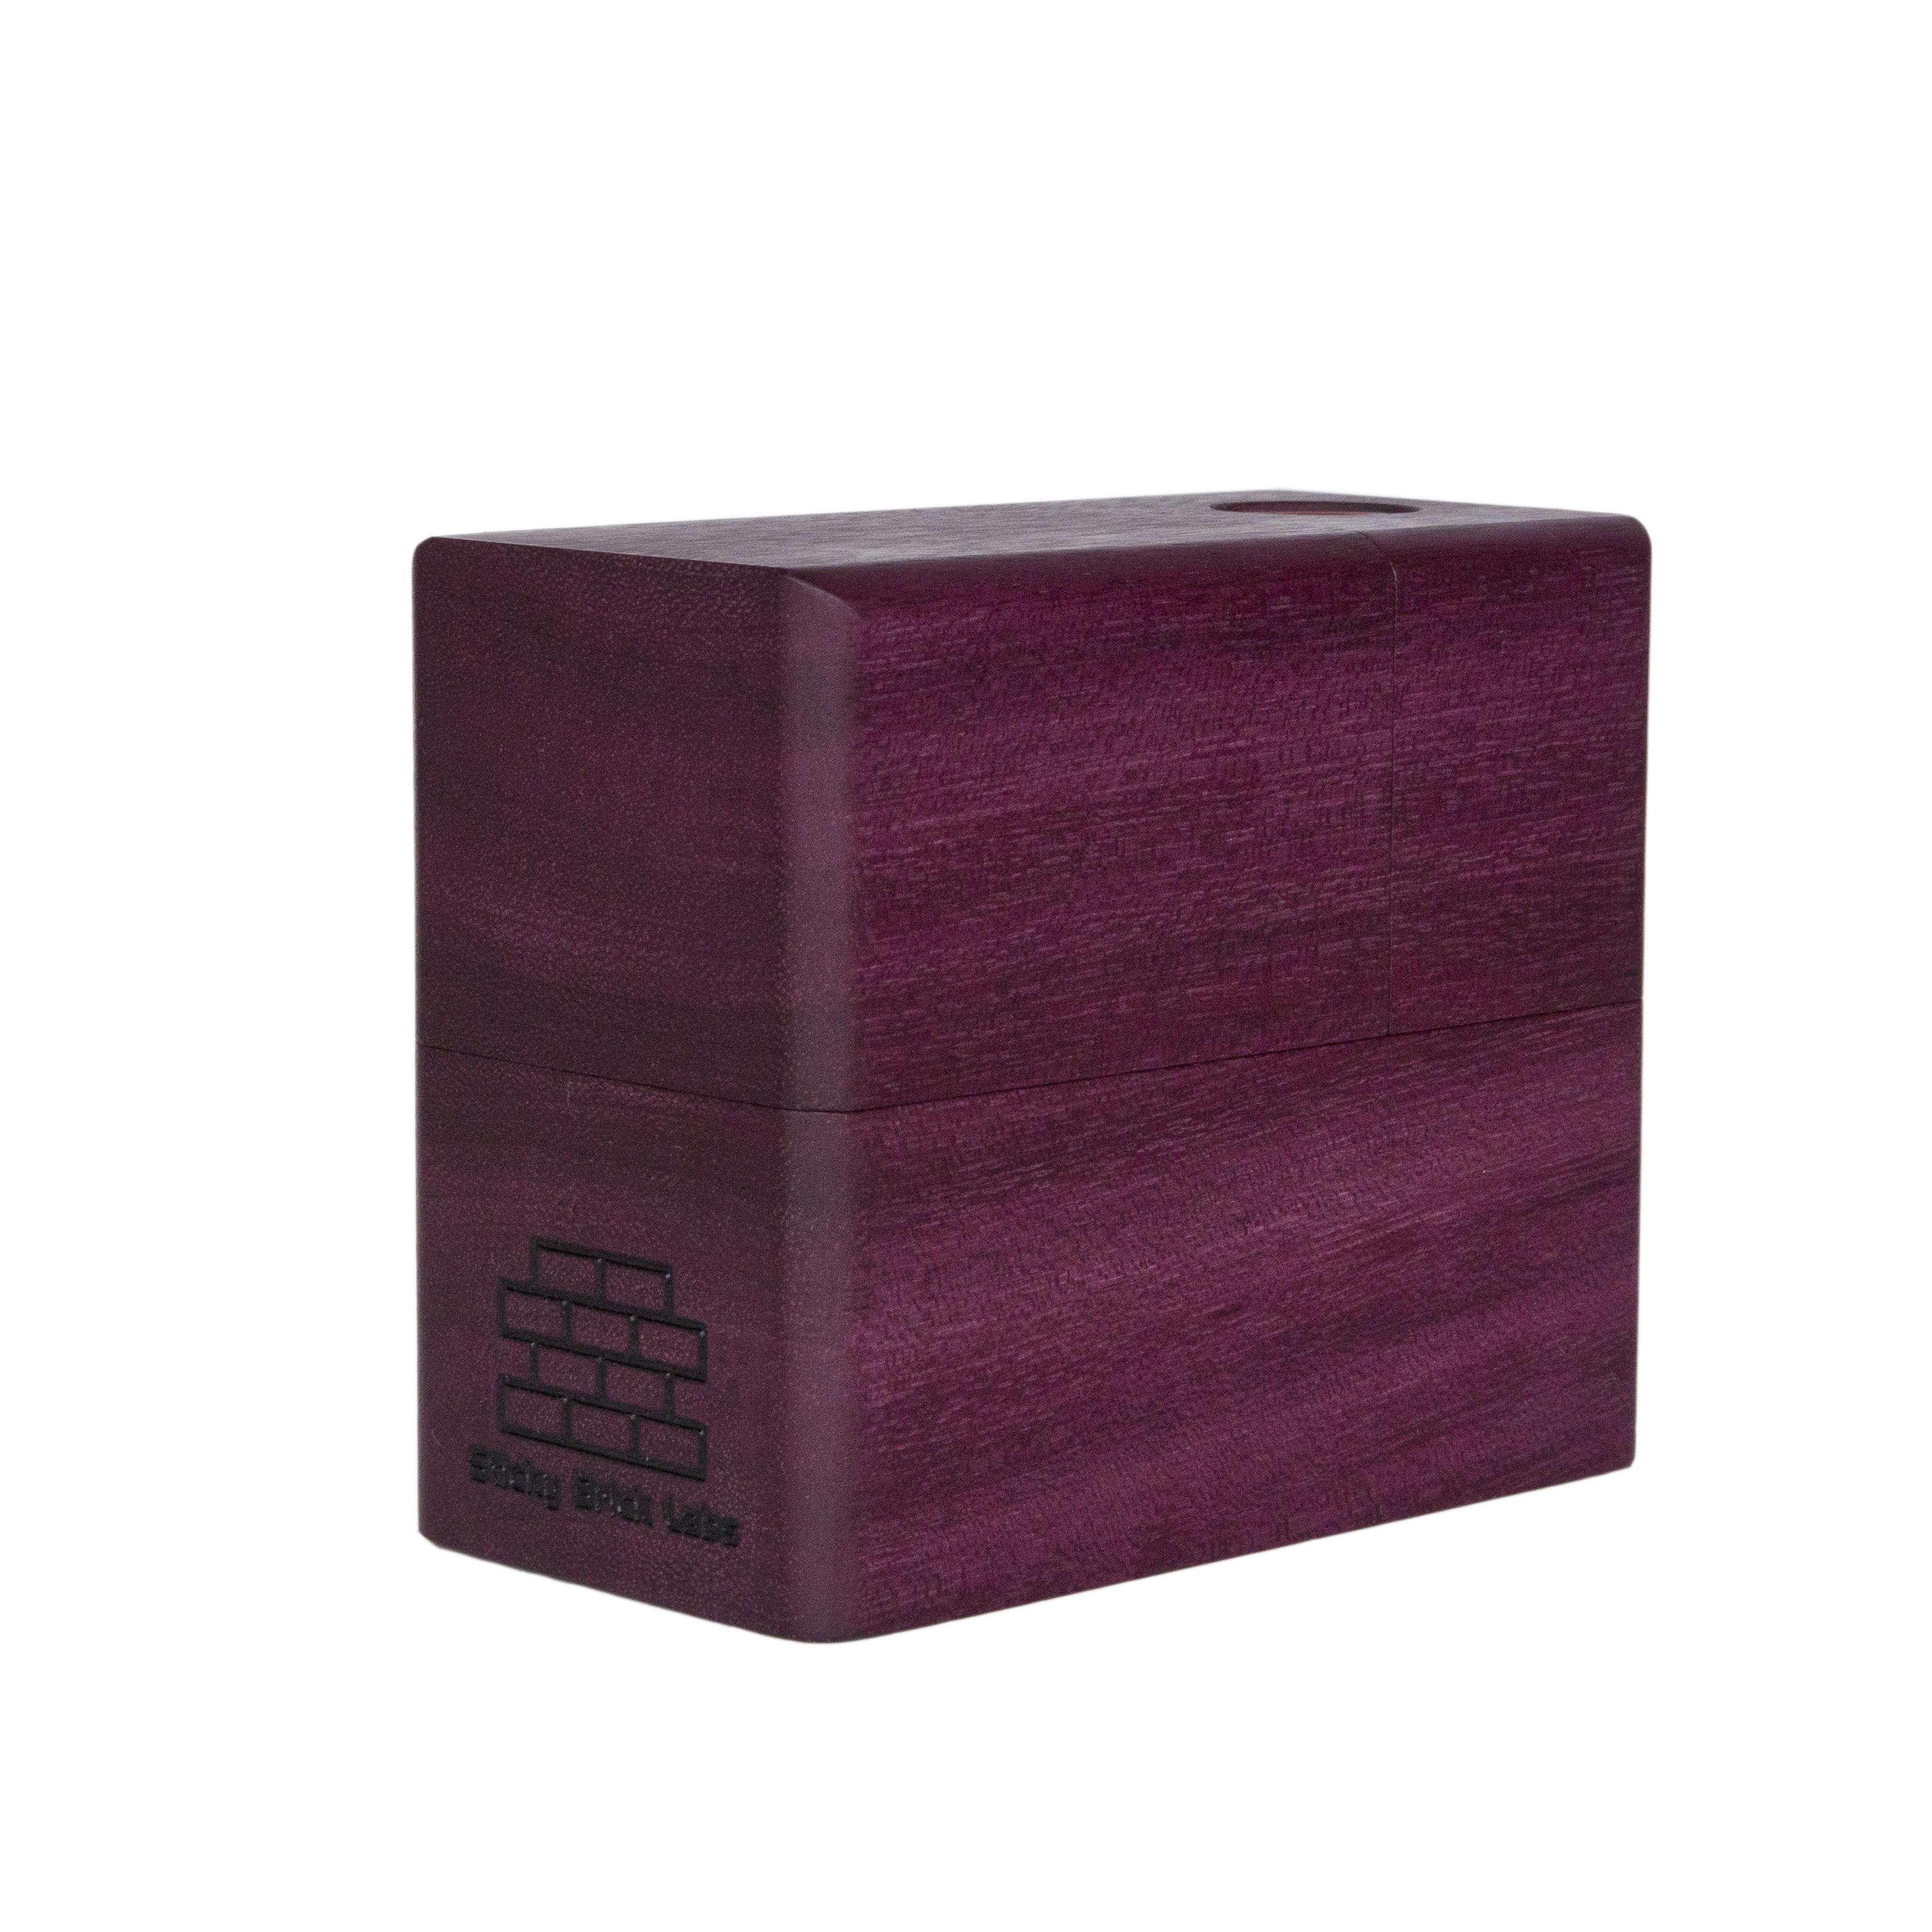 Maxx Purple Heart MA2400PU